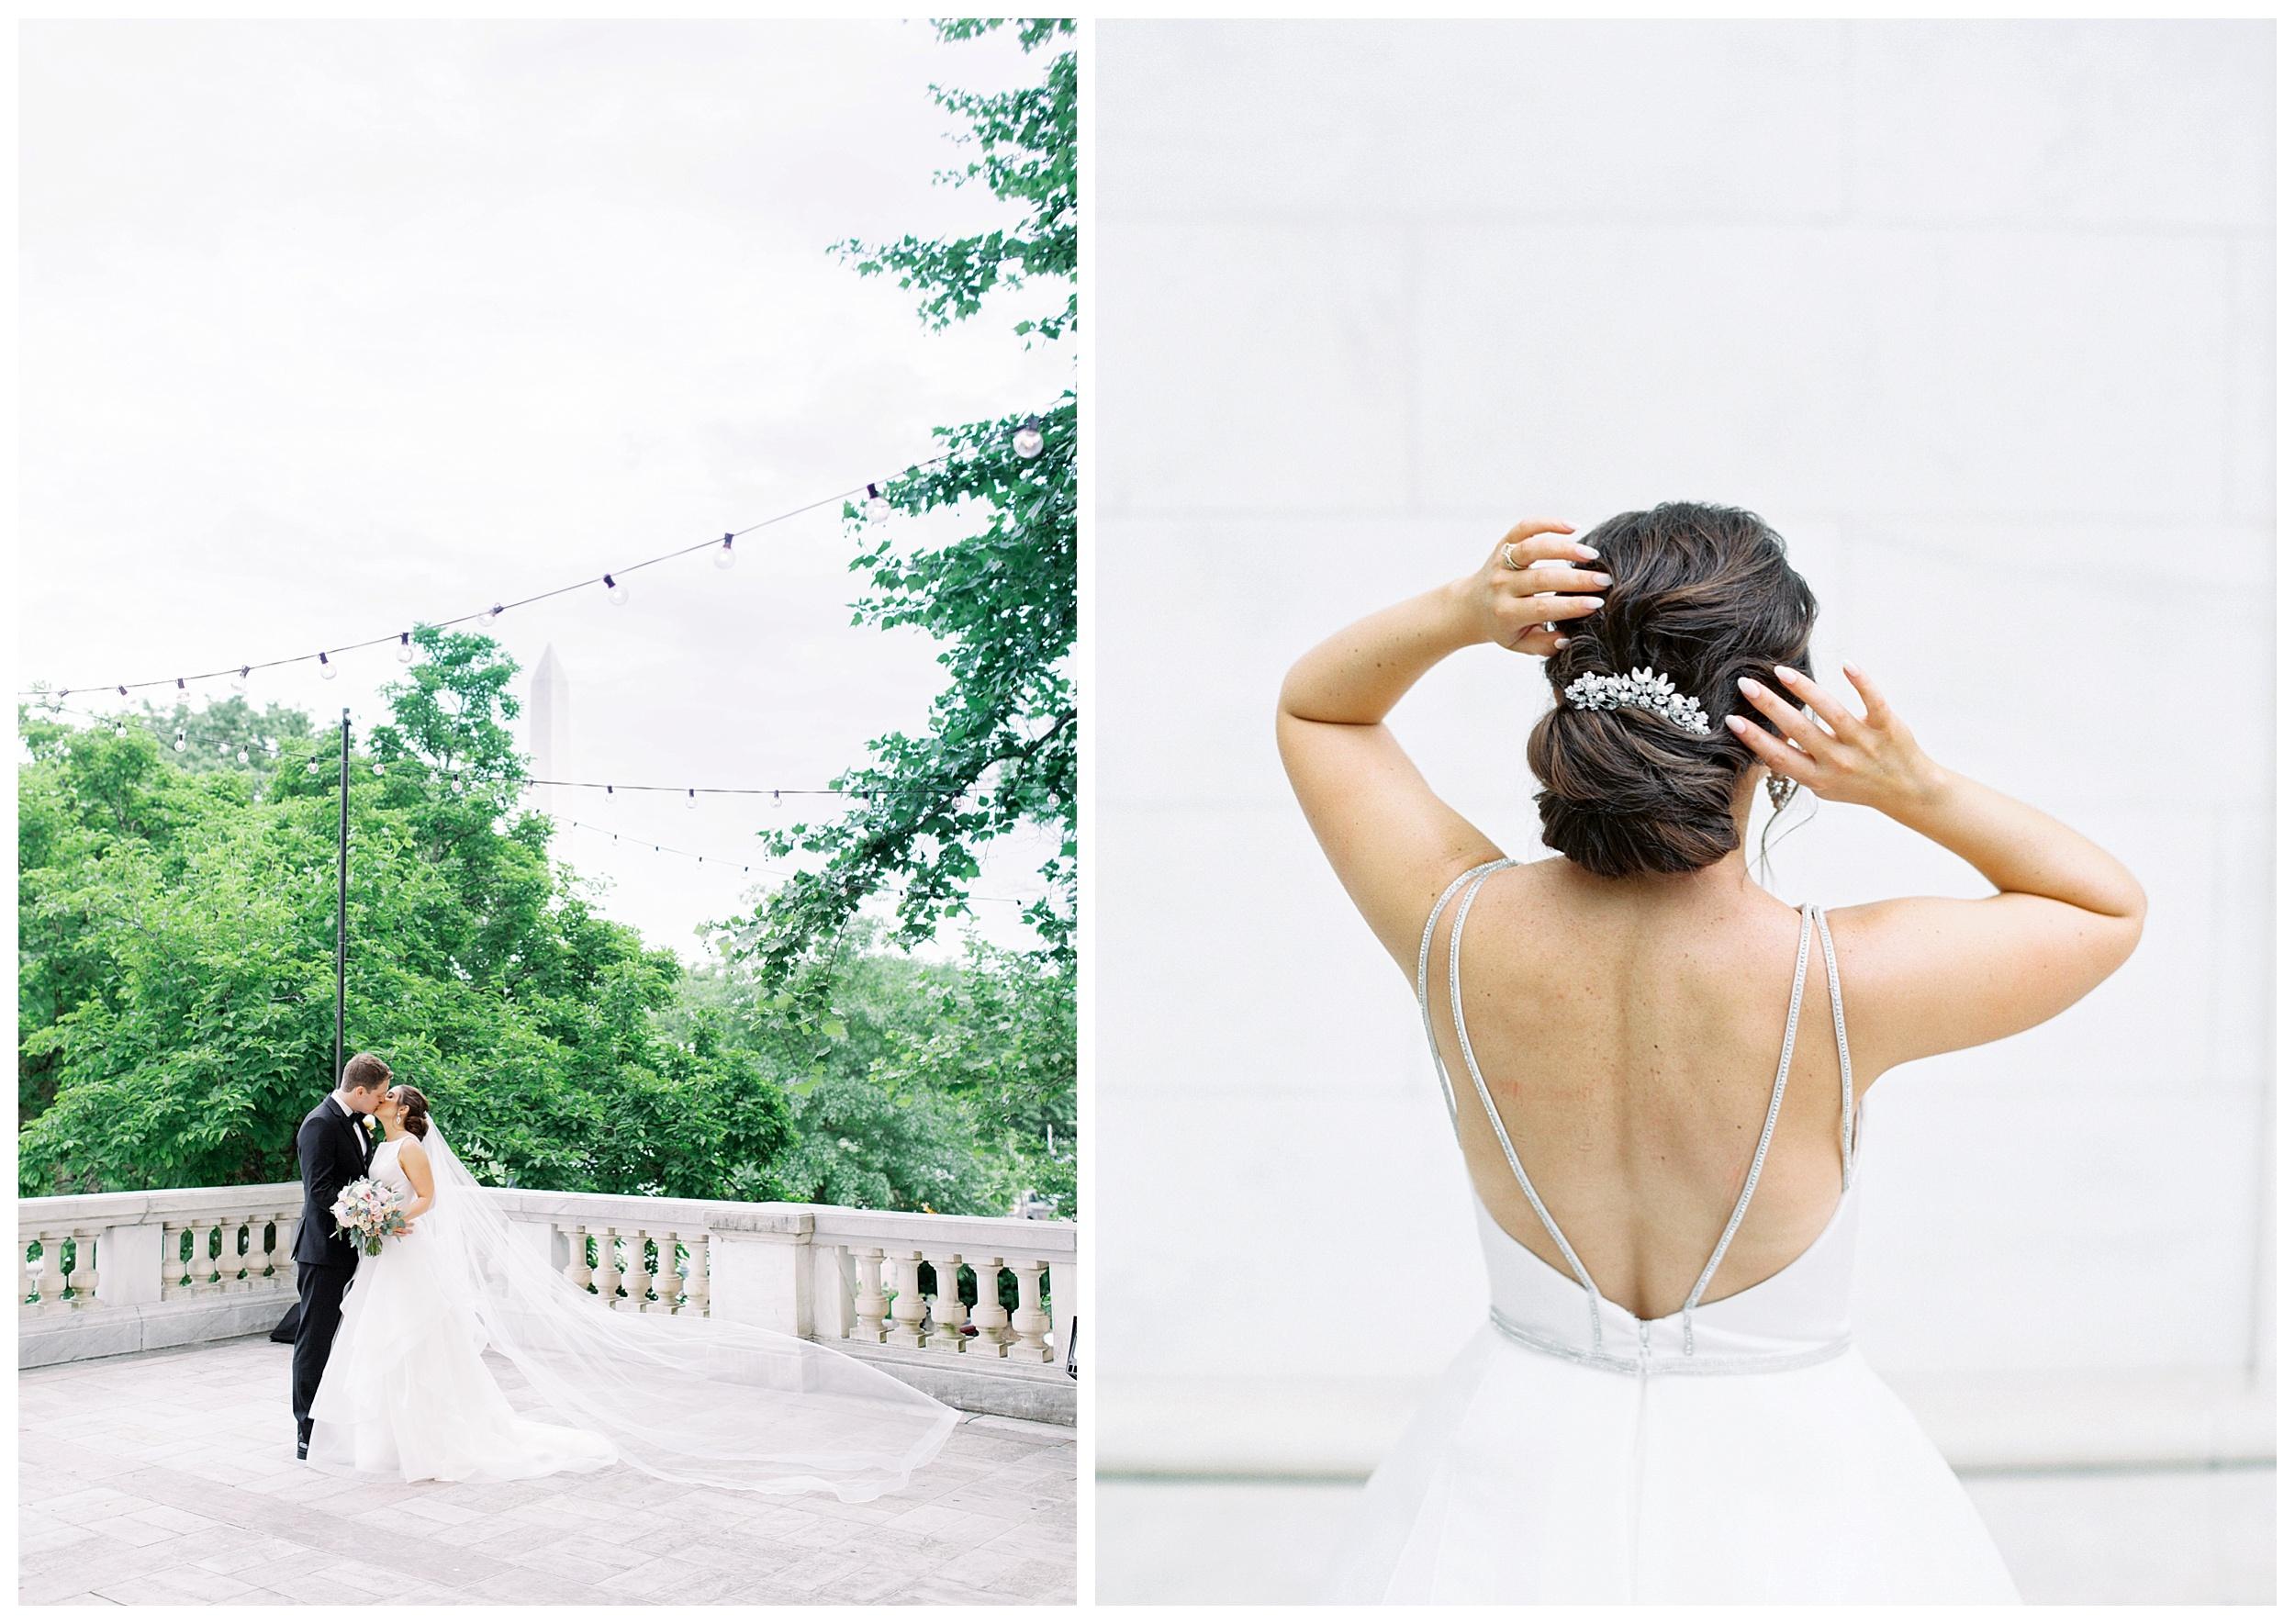 DAR Constitution Hall Wedding Wedding | Daughters of the American Revolution Wedding | District of Columbia Film Wedding Photographer Kir Tuben_0099.jpg